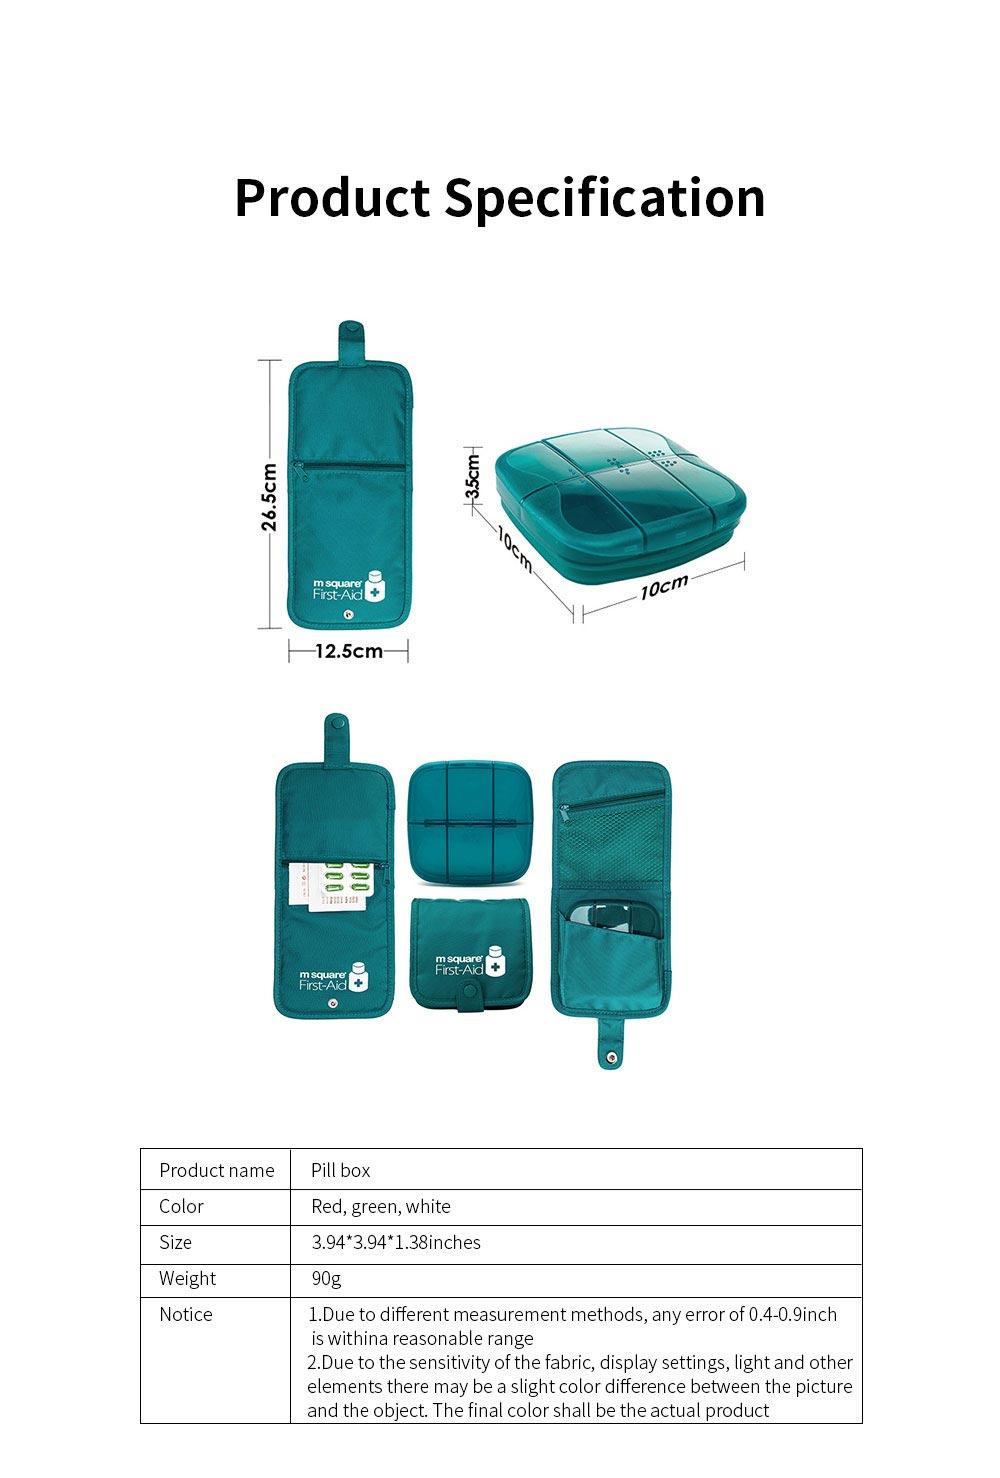 m square Travel BPA Free Plastic Pill Box Case 6 Compartments Pill Organizer Portable Tablet Holder 6